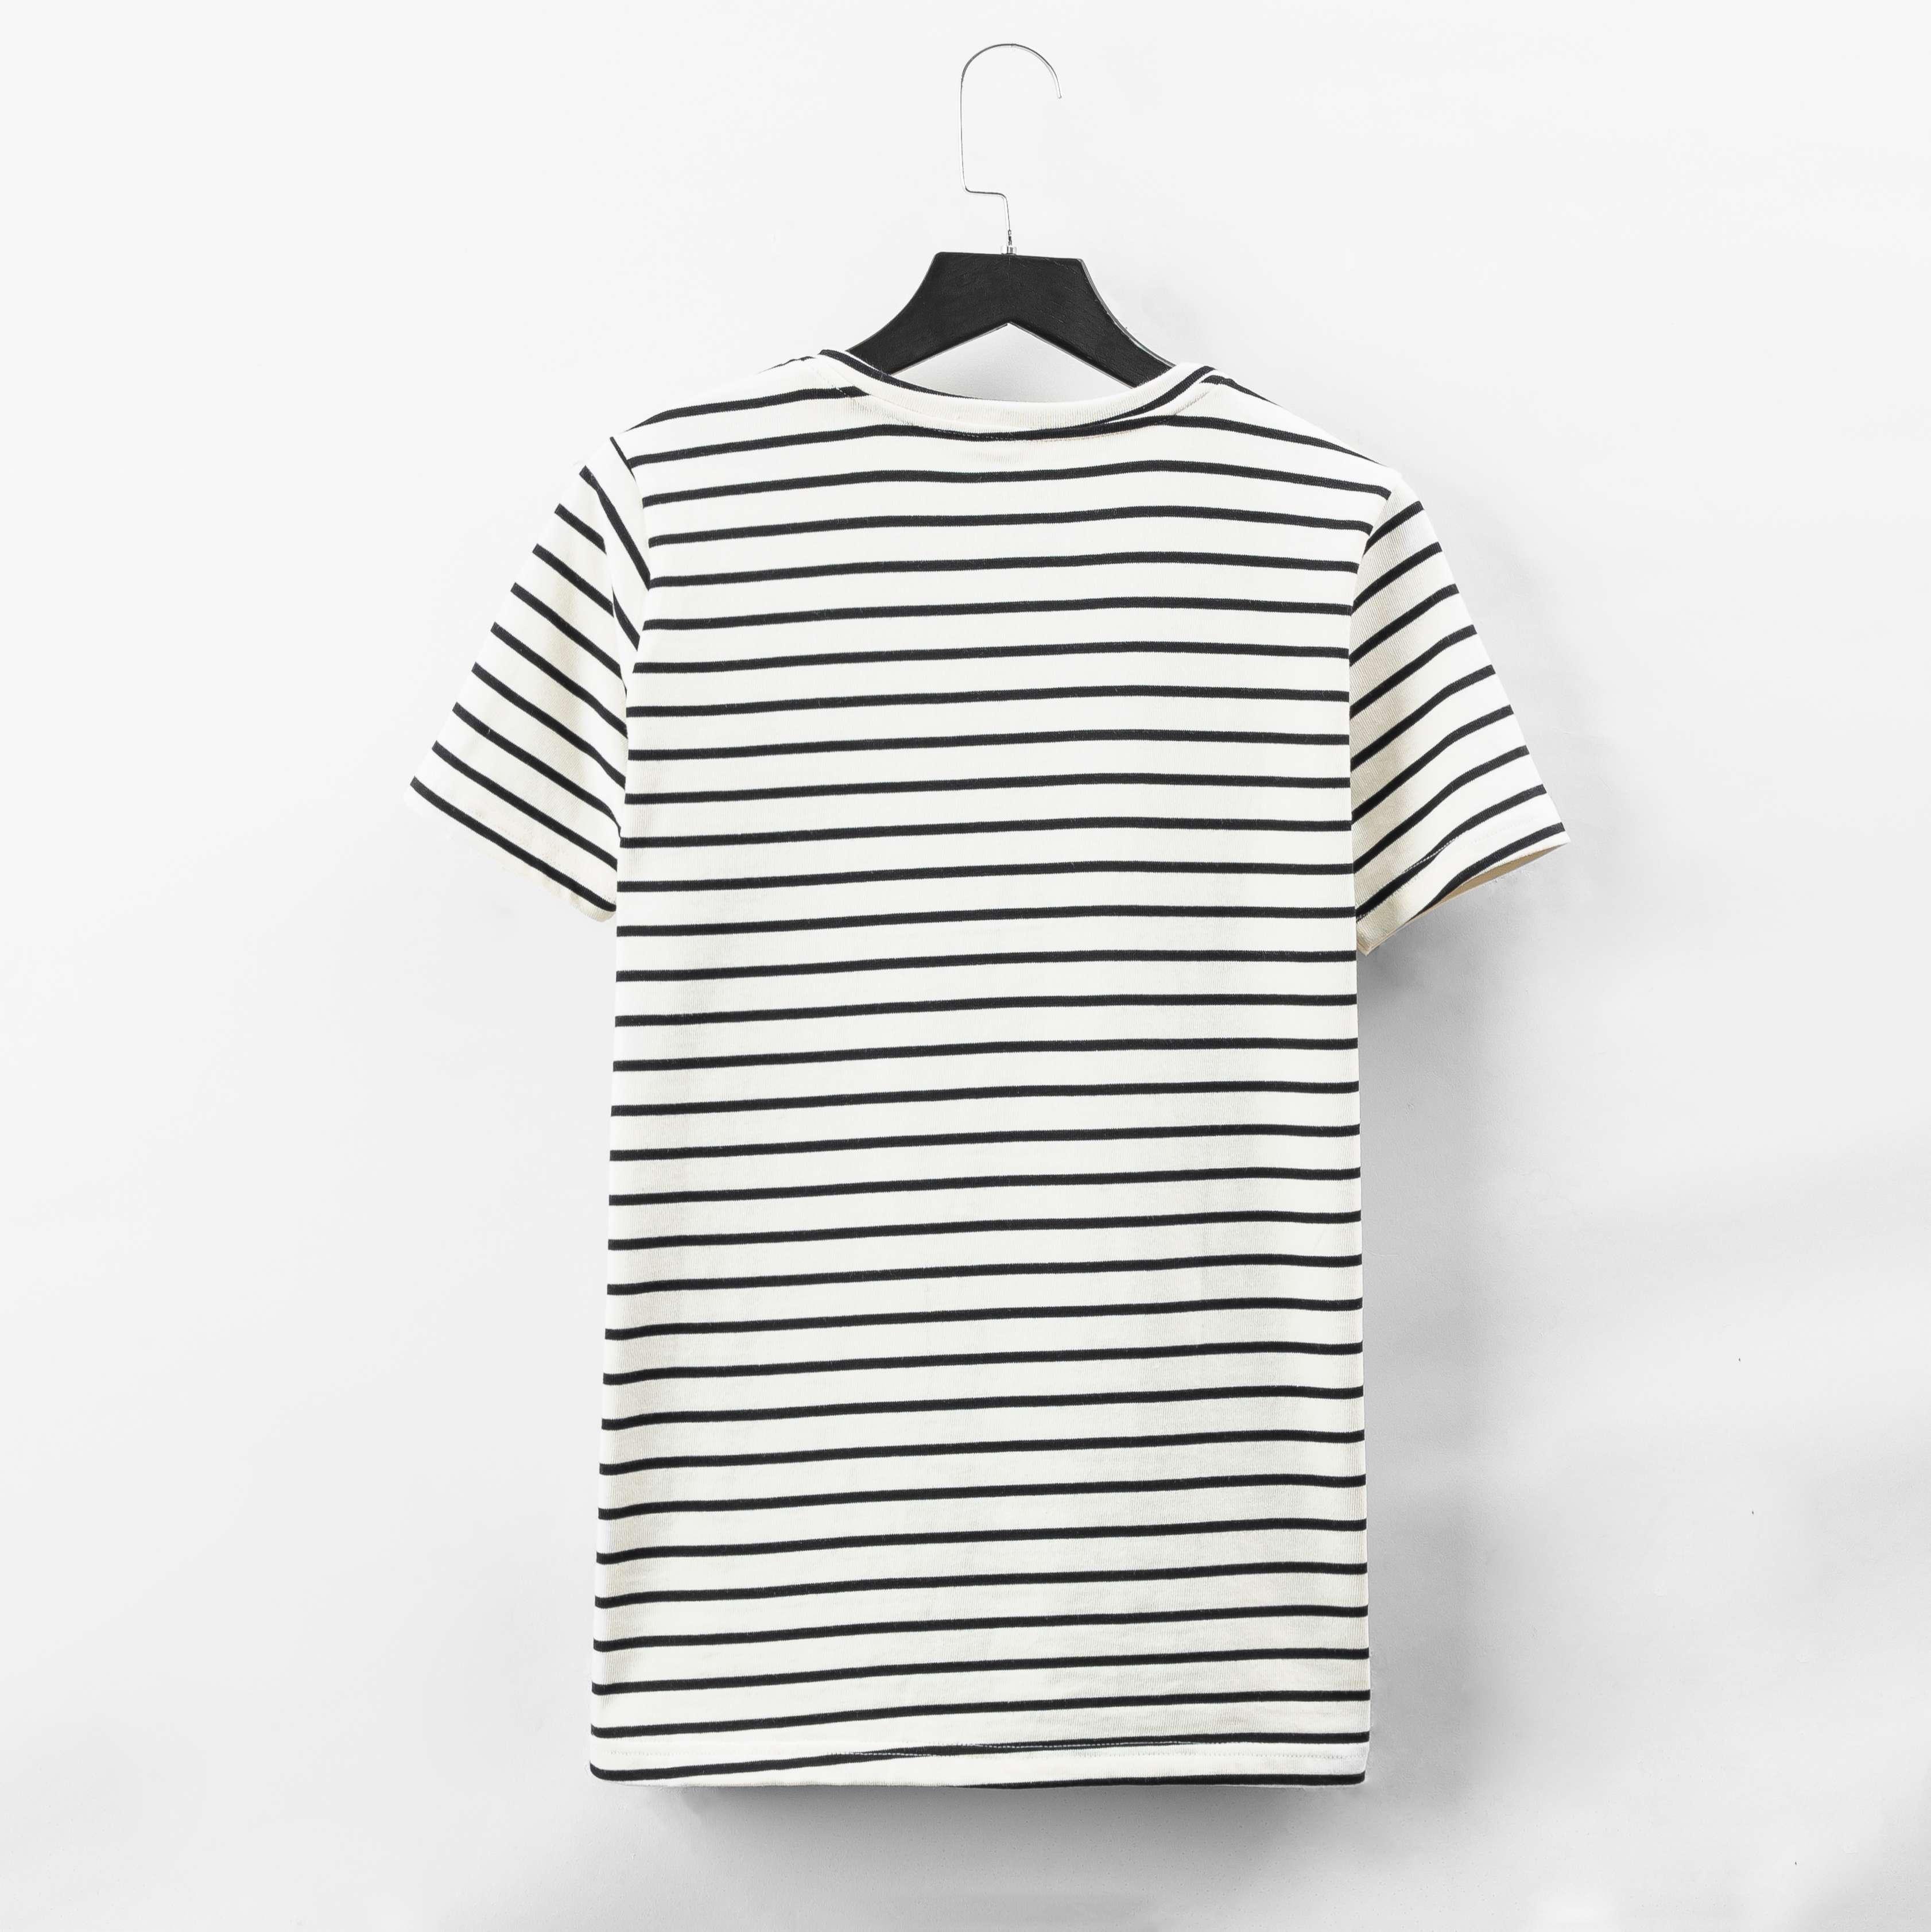 SP247 - Áo Thun Roomy Striped